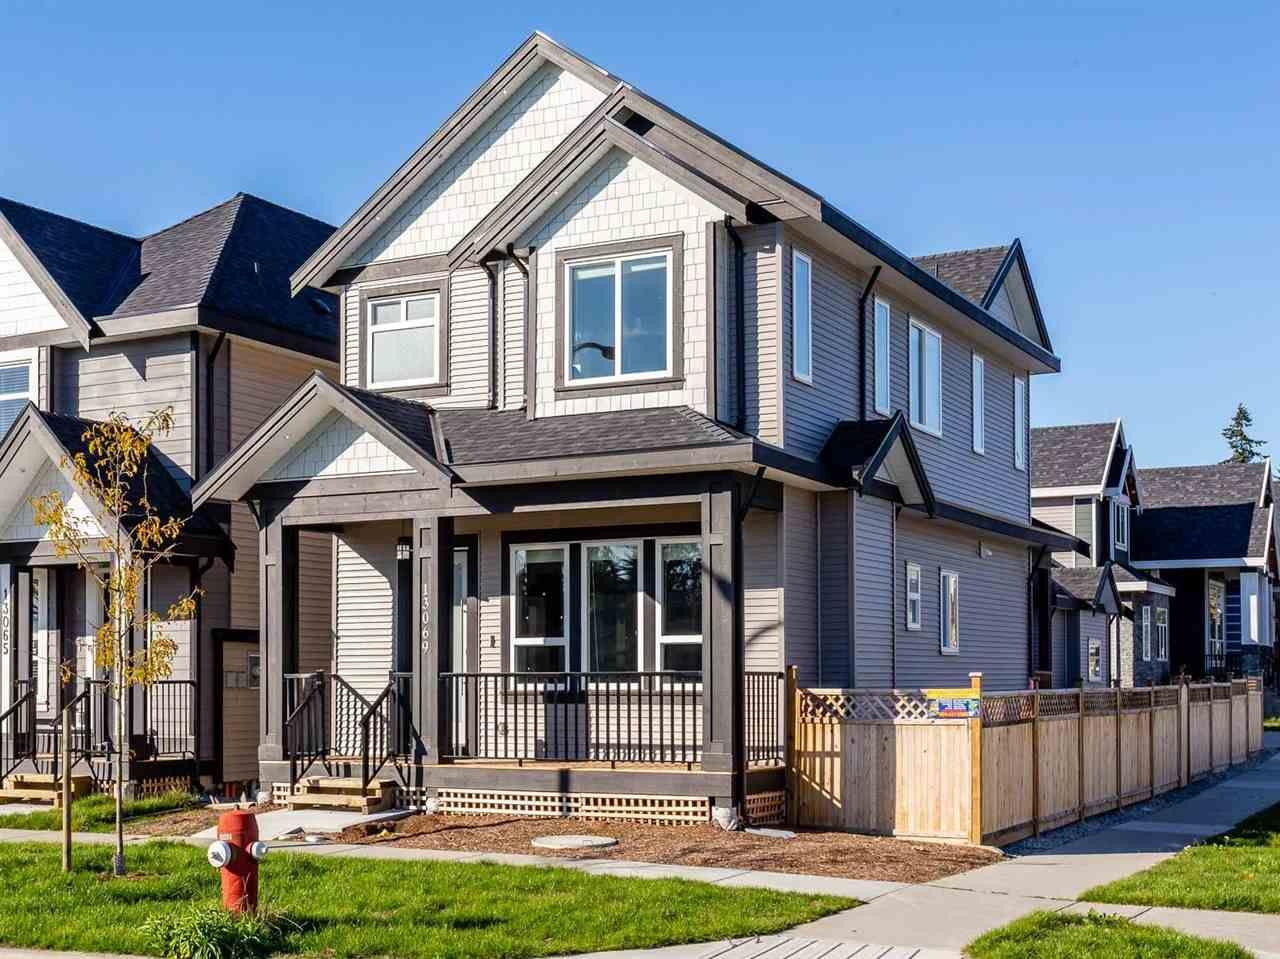 Main Photo: 13069 59 Avenue in Surrey: Panorama Ridge House for sale : MLS®# R2315936